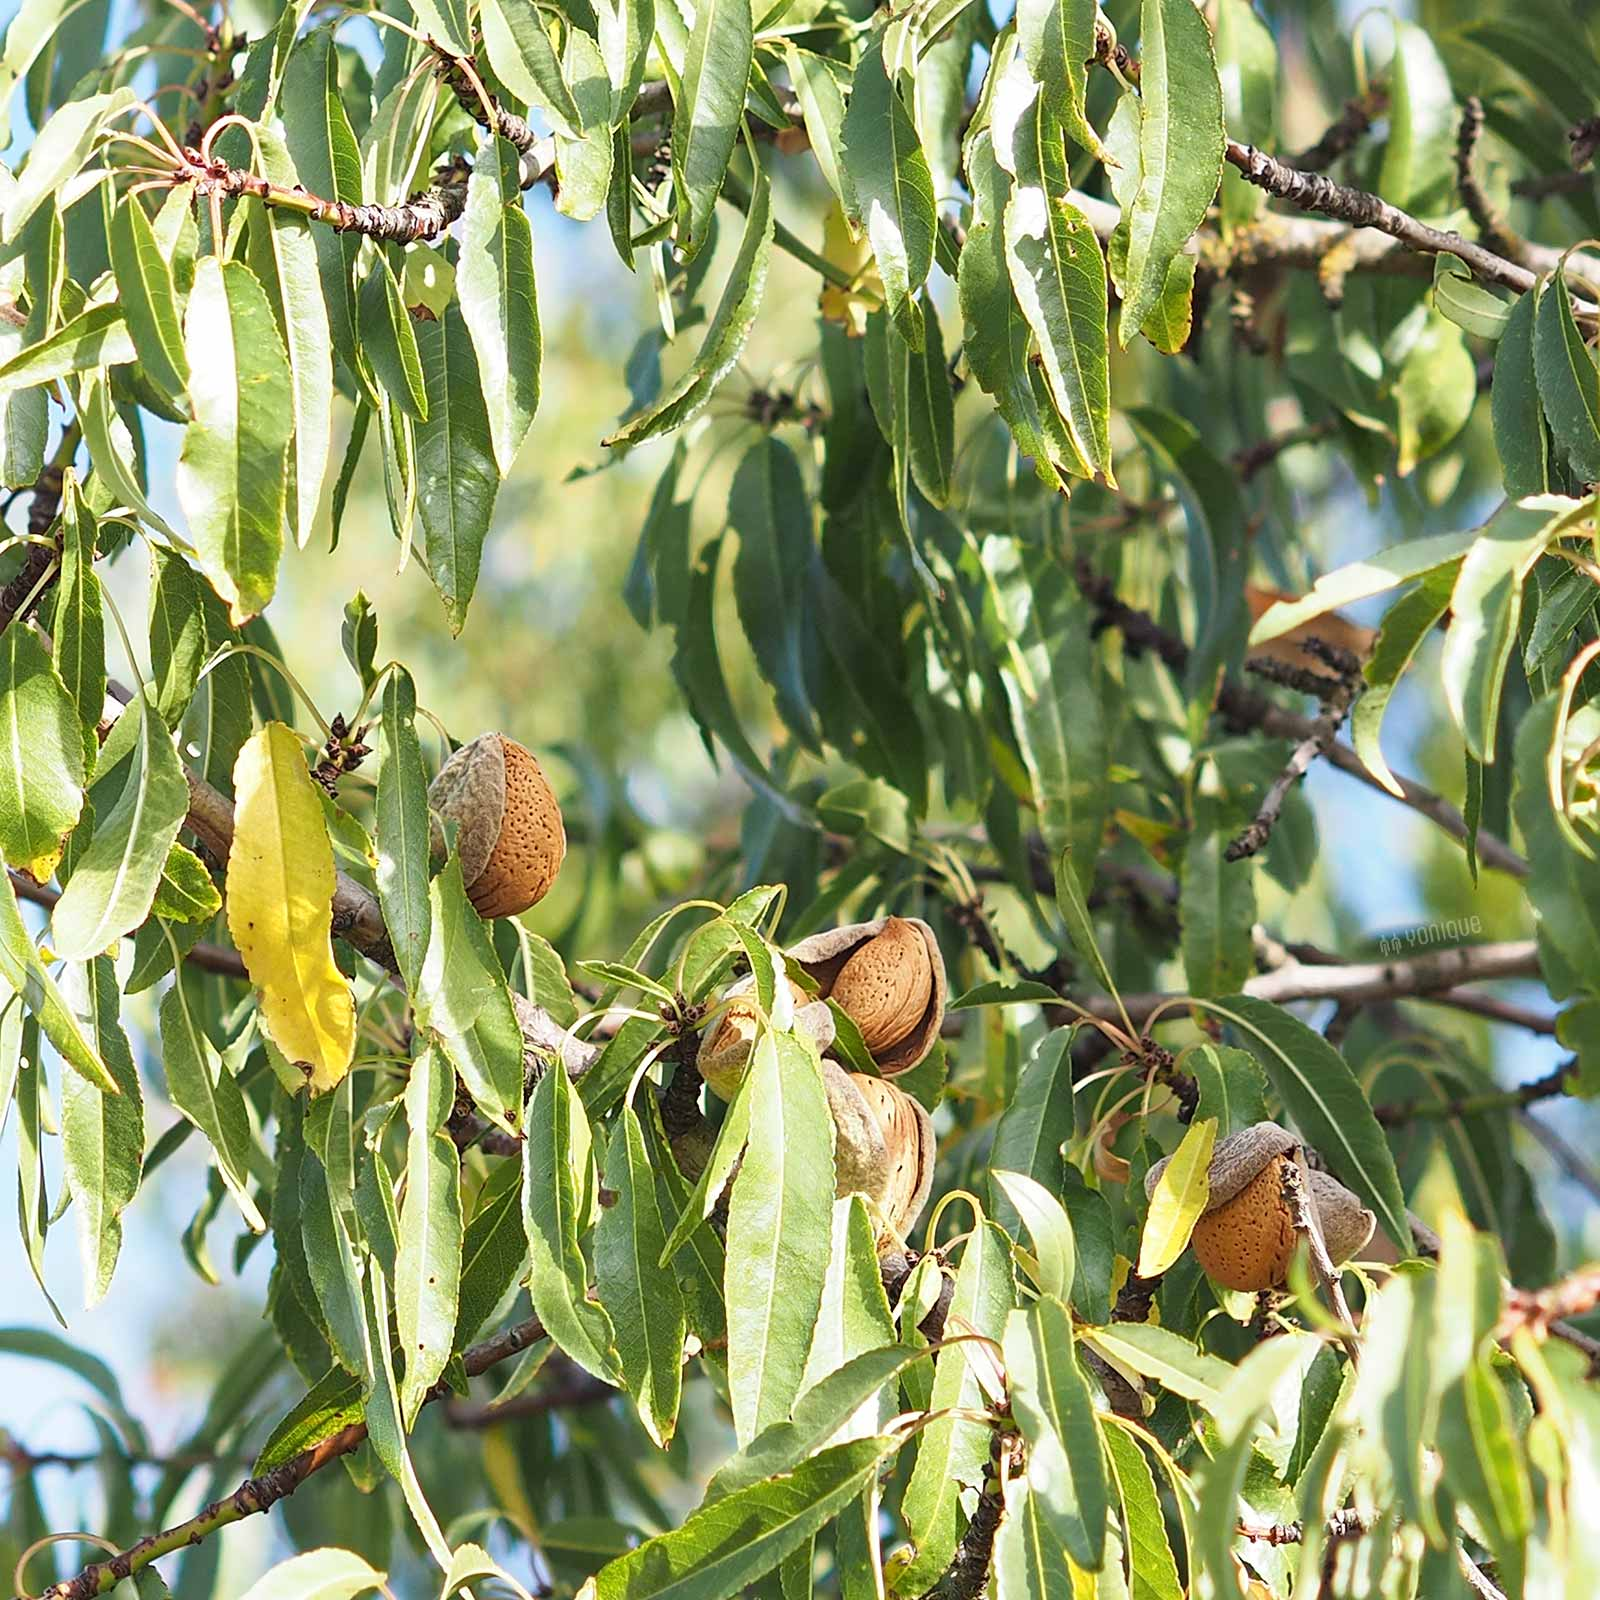 ete-amandier-almond-september-cigales-castilla-leon-verano-laboutiquedemelimelo